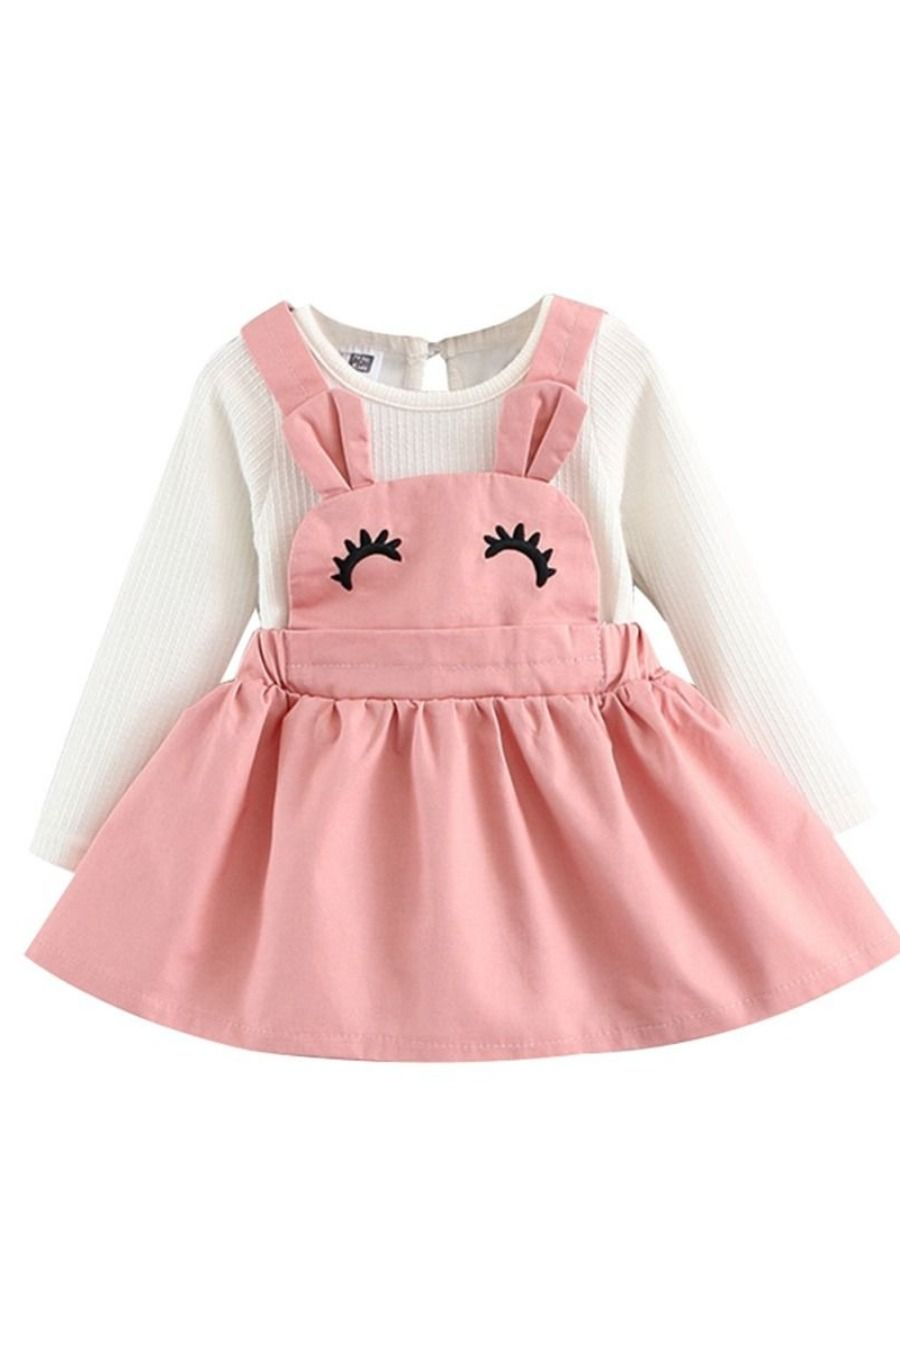 Toddler Kid Baby Girls Fake two Dress Princess Party Wedding suspenders Dresses